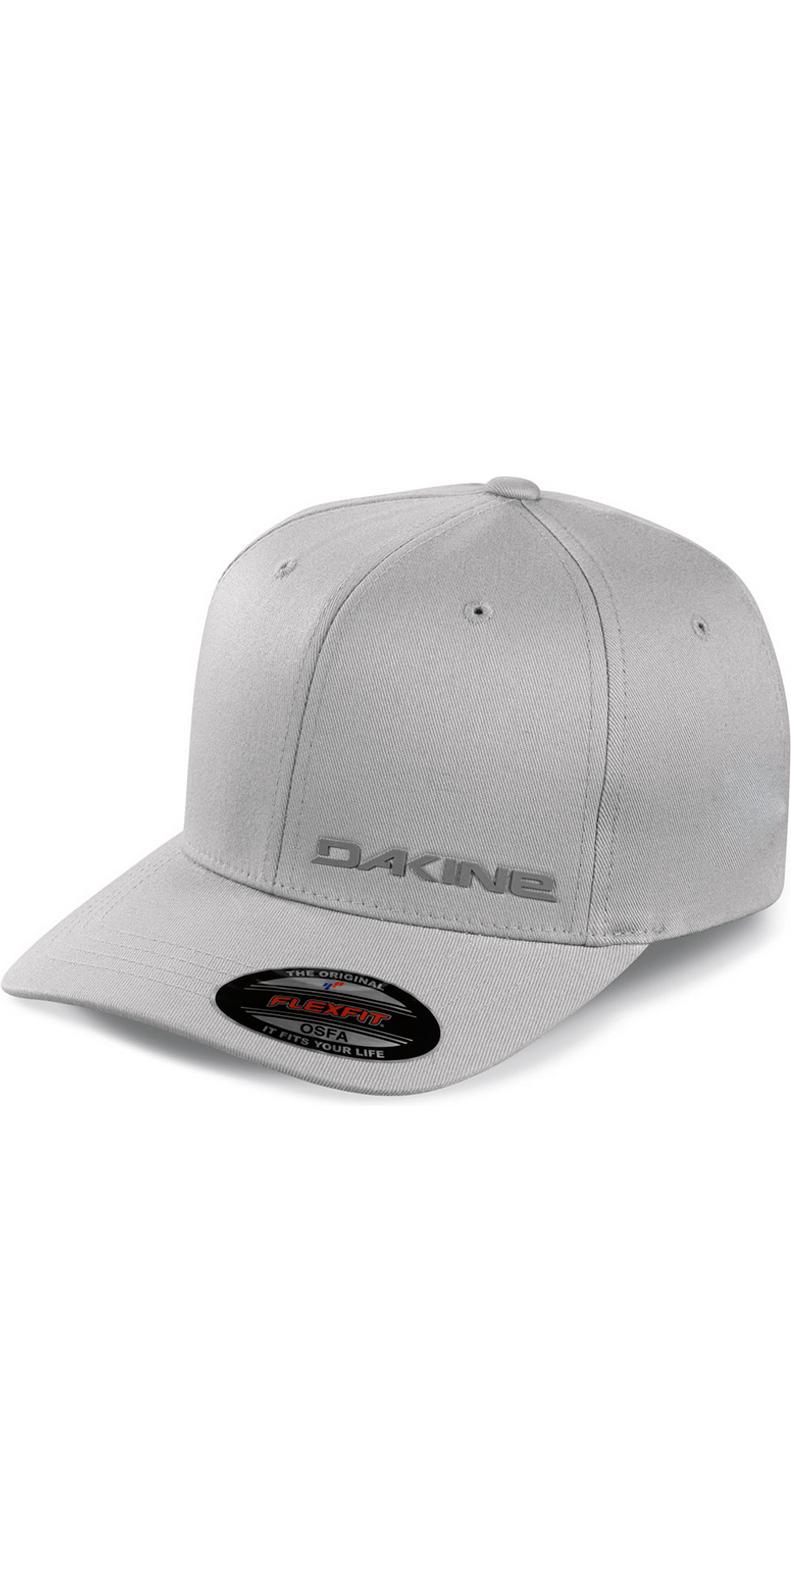 2018 Dakine Silicone Rail Flexfit Cap in Grey 08640040